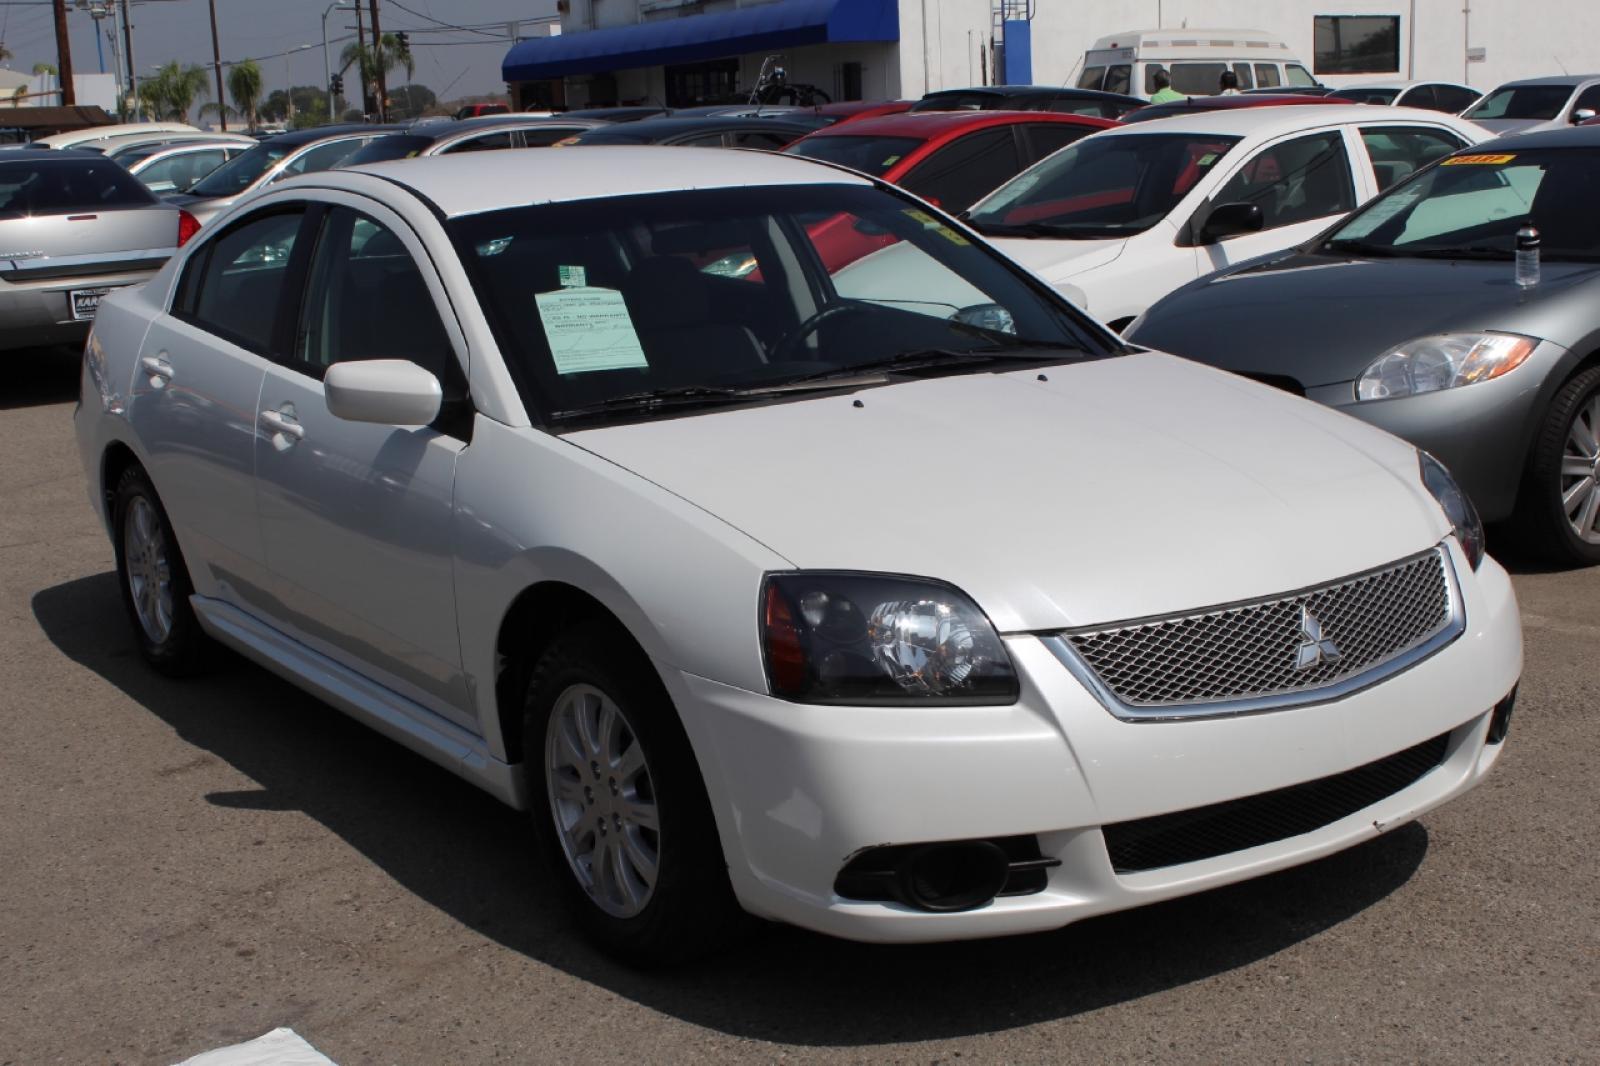 2010 Mitsubishi Galant Sedan Pictures Photo Gallery